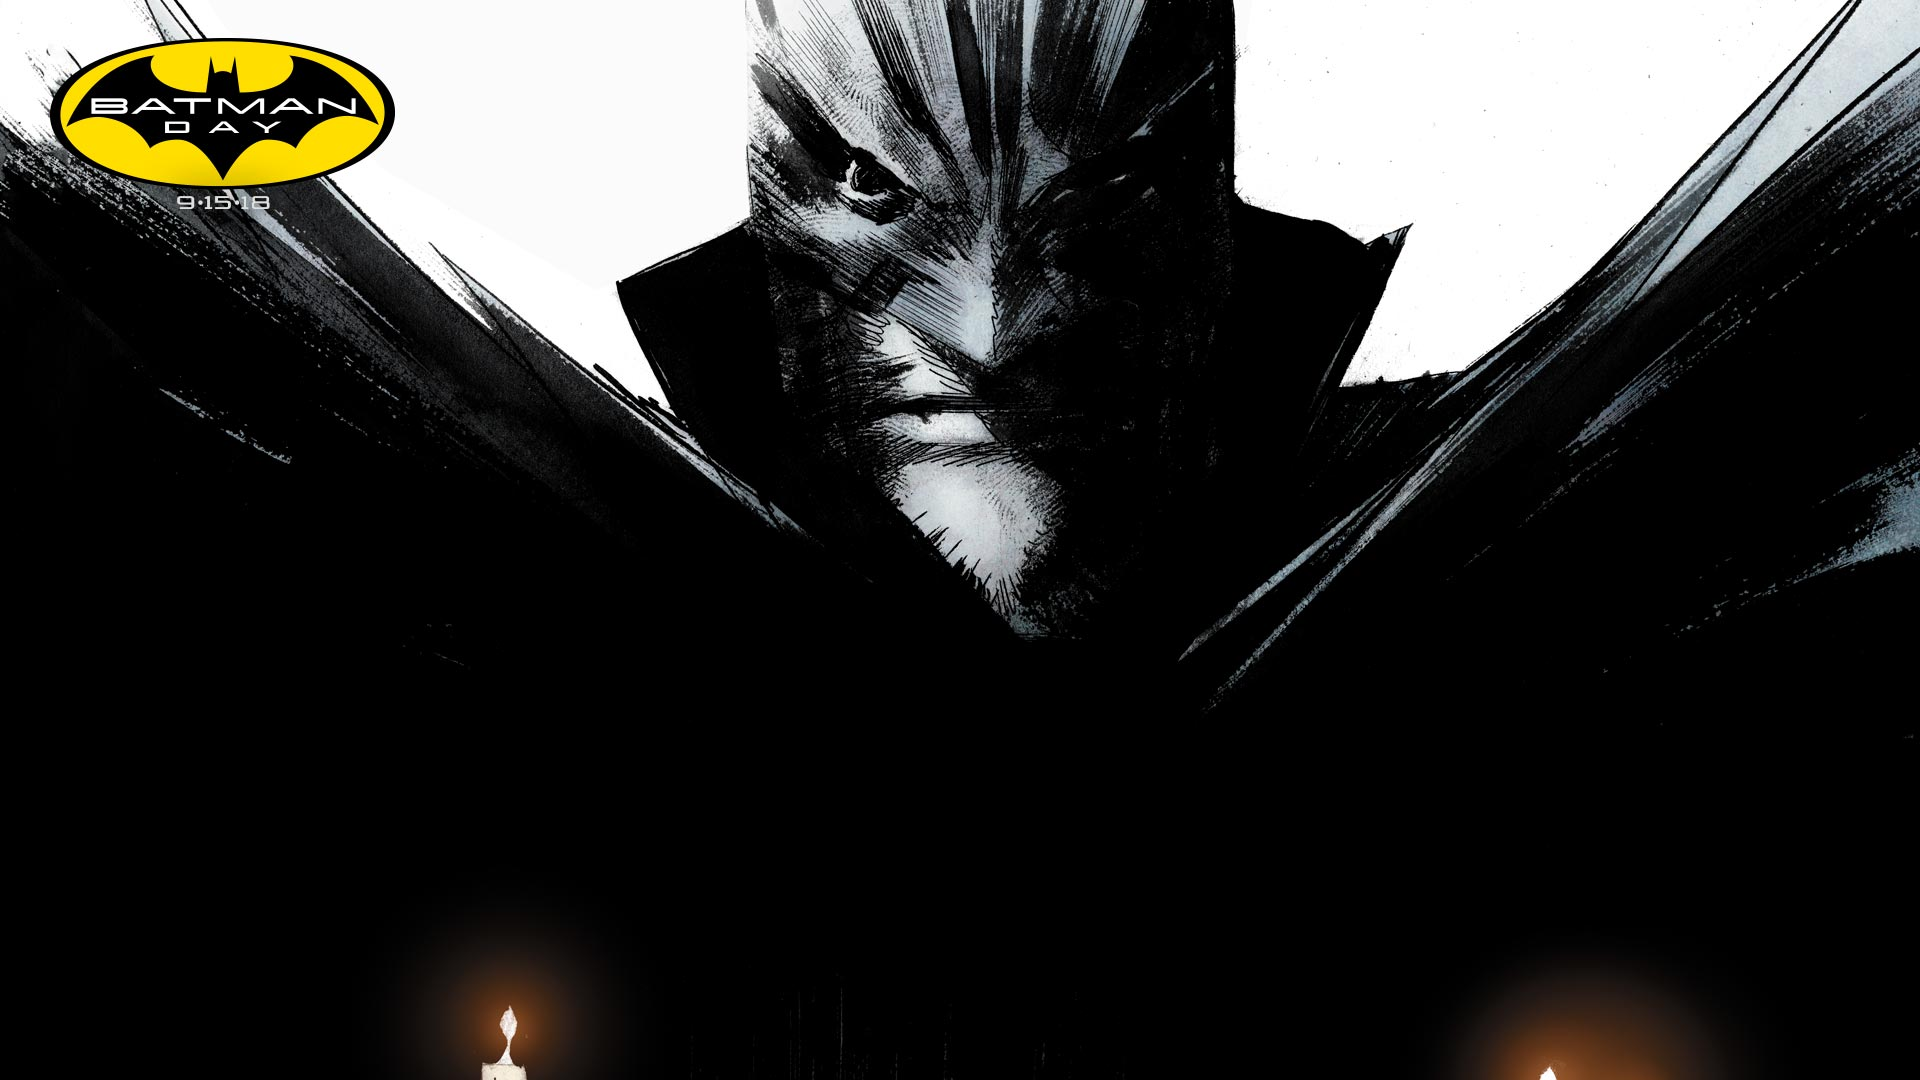 BatmanDay2018.jpg